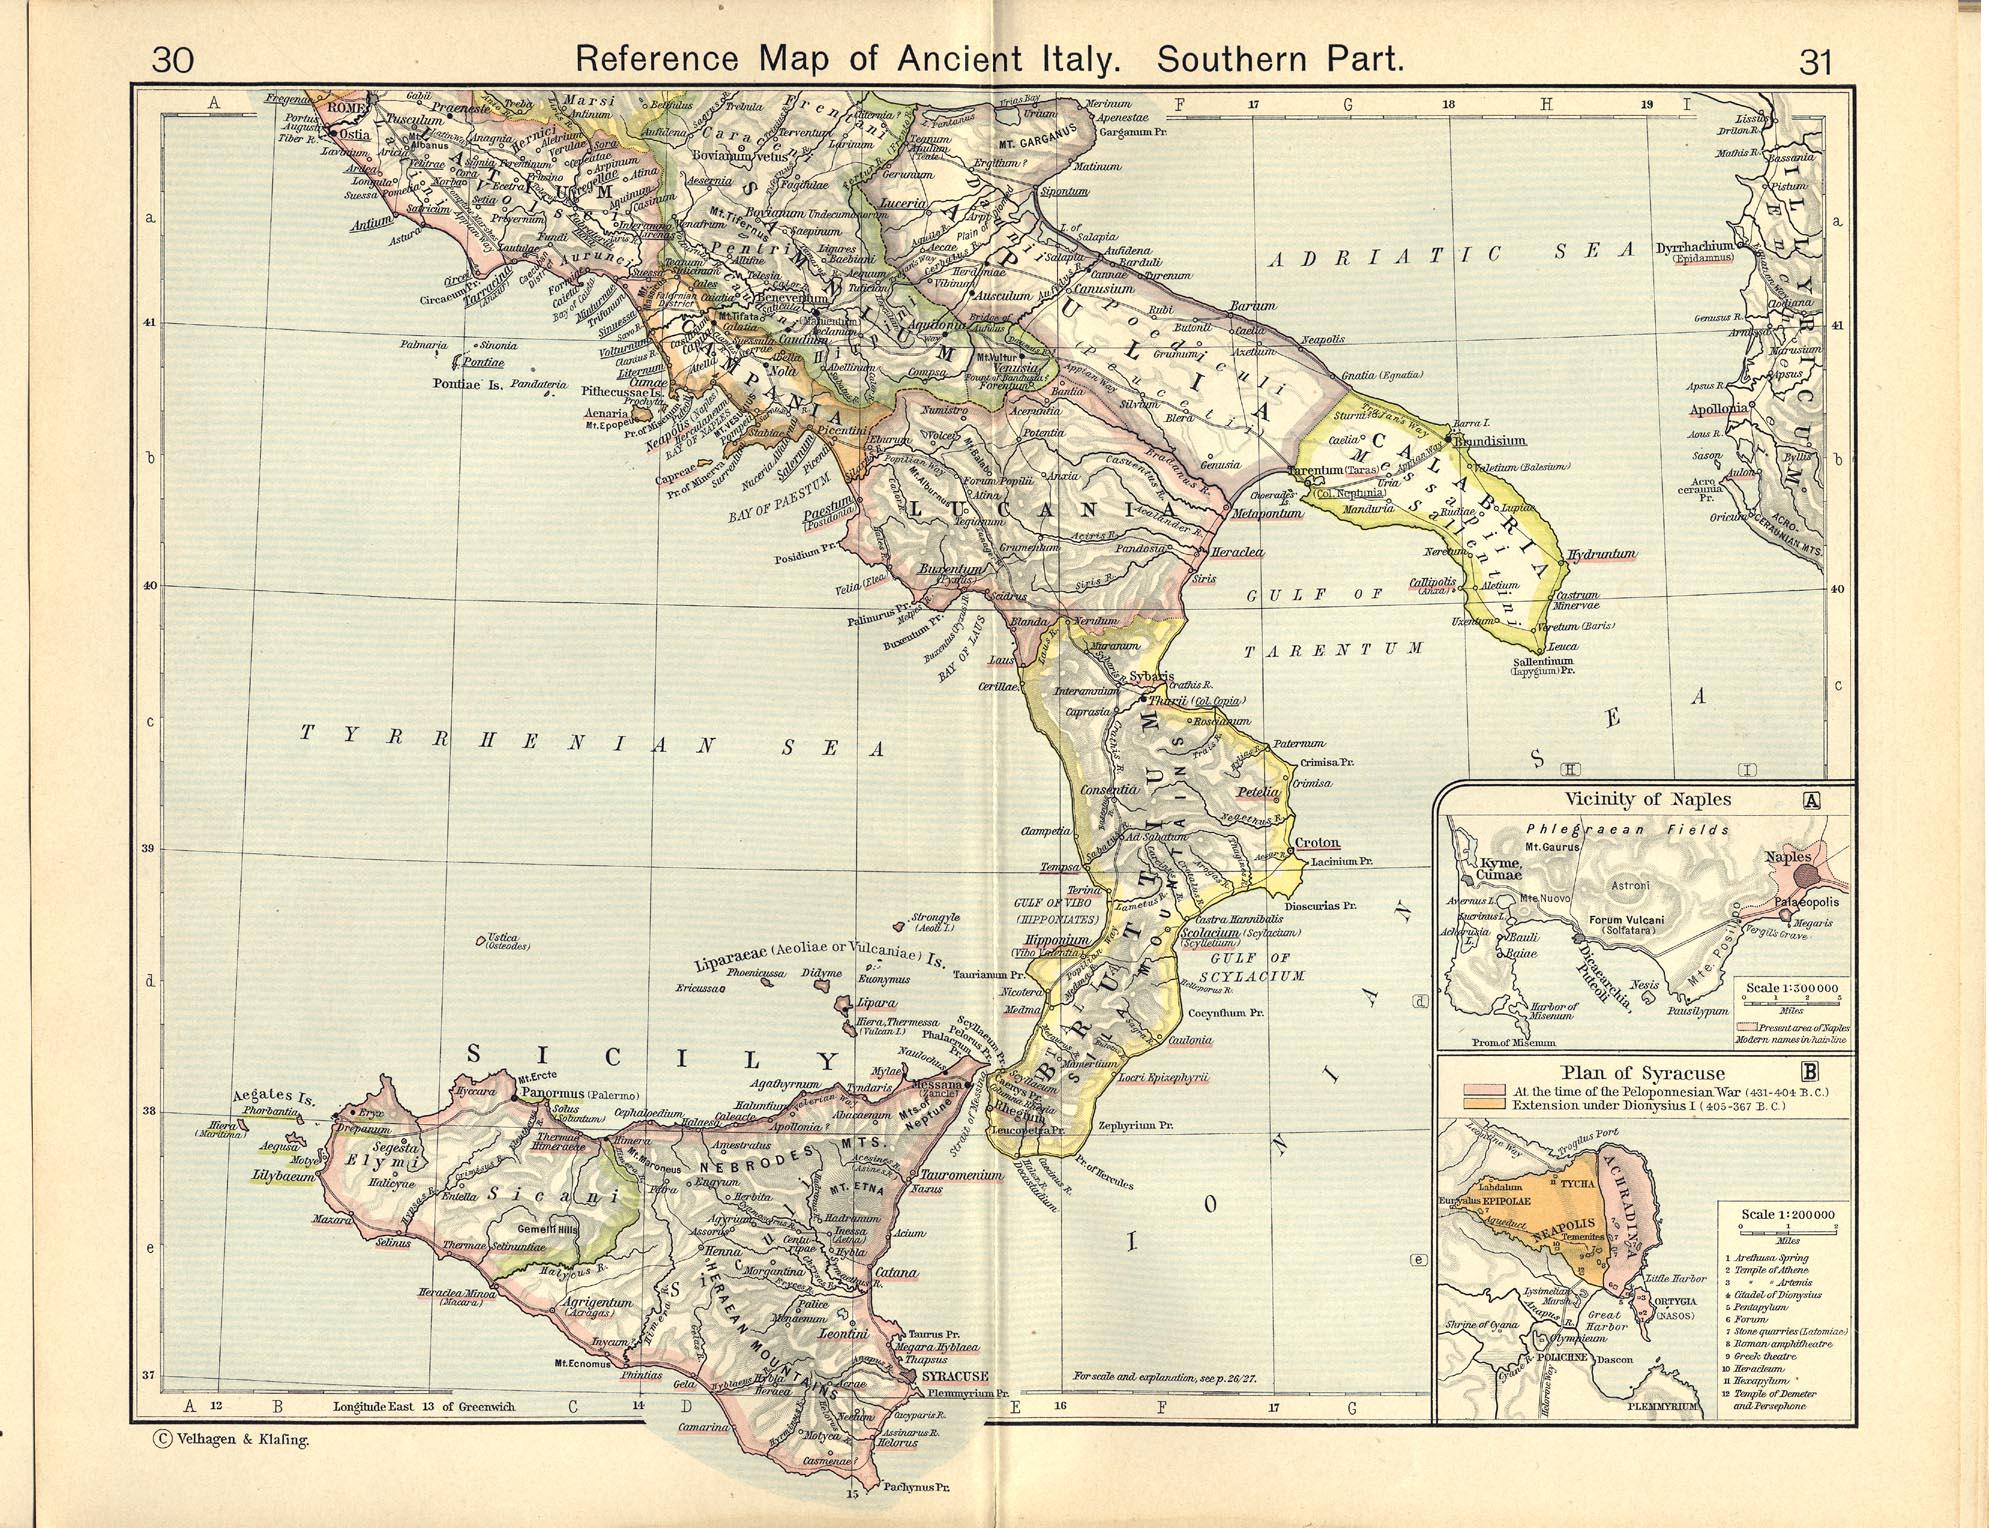 Mapa de Referencia del Sur de la Italia Antigua